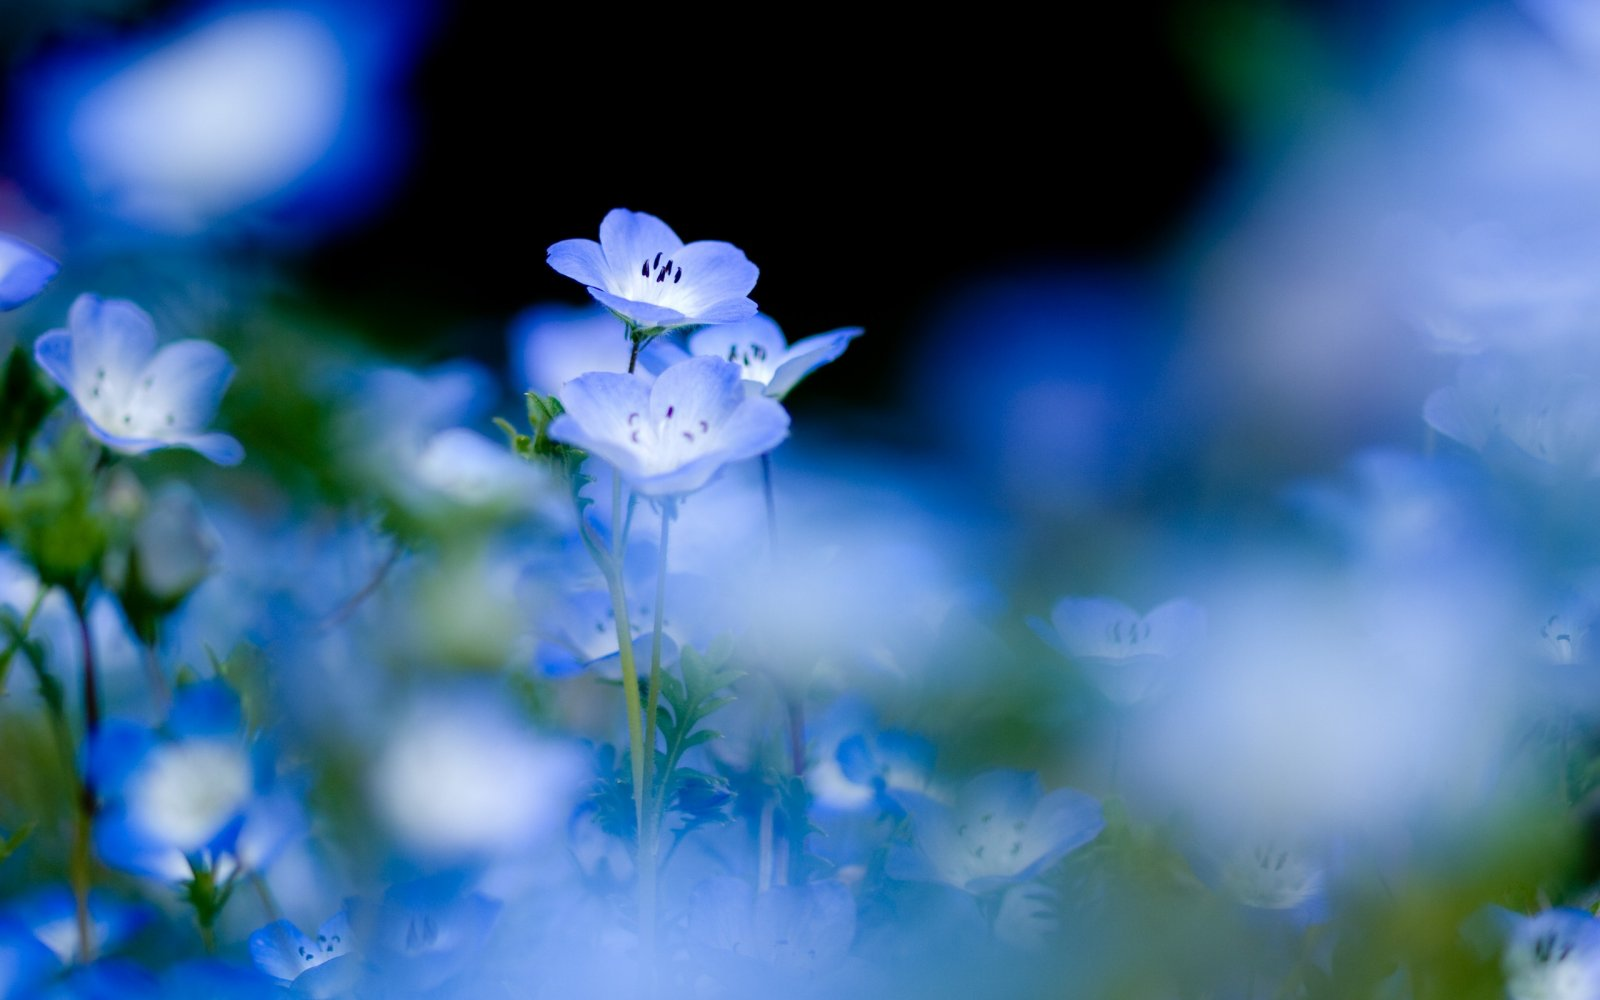 """""""... En azul..."""""" - Página 2 Paisaje-flores-azules"